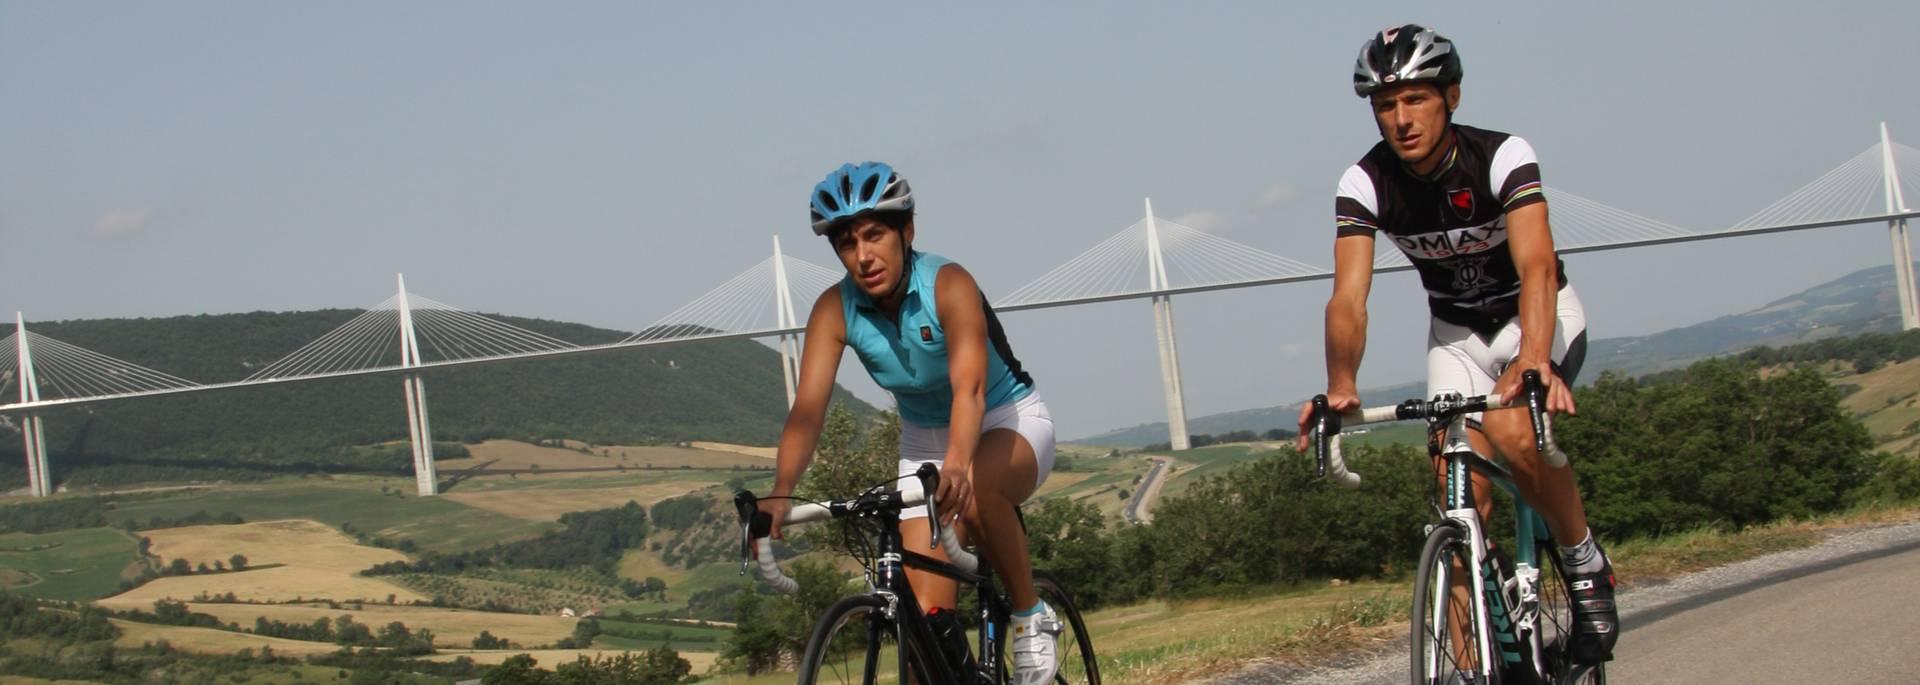 12 circuits cyclo tourisme autour de Millau